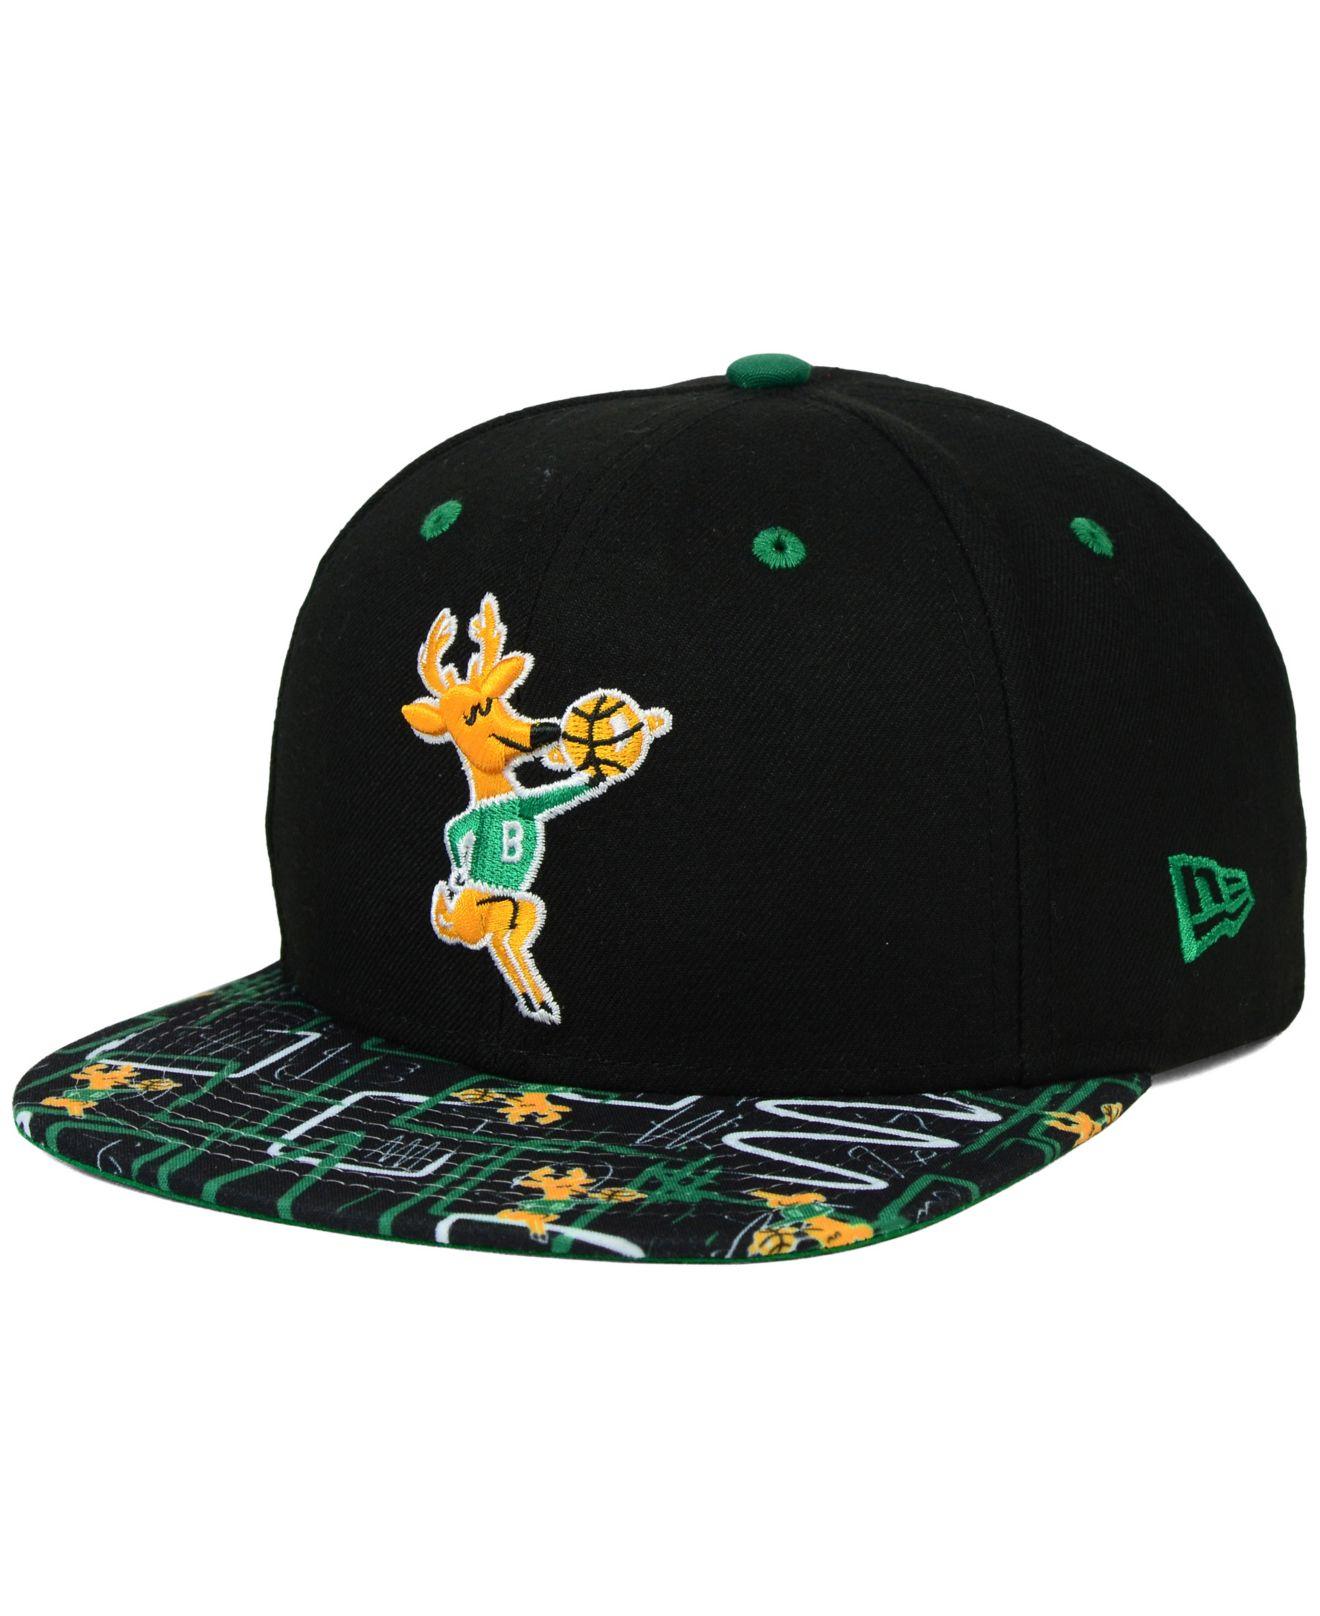 online store c8d1e 64c59 KTZ Milwaukee Bucks Hwc Tag It 9fifty Snapback Cap in Black for Men ...